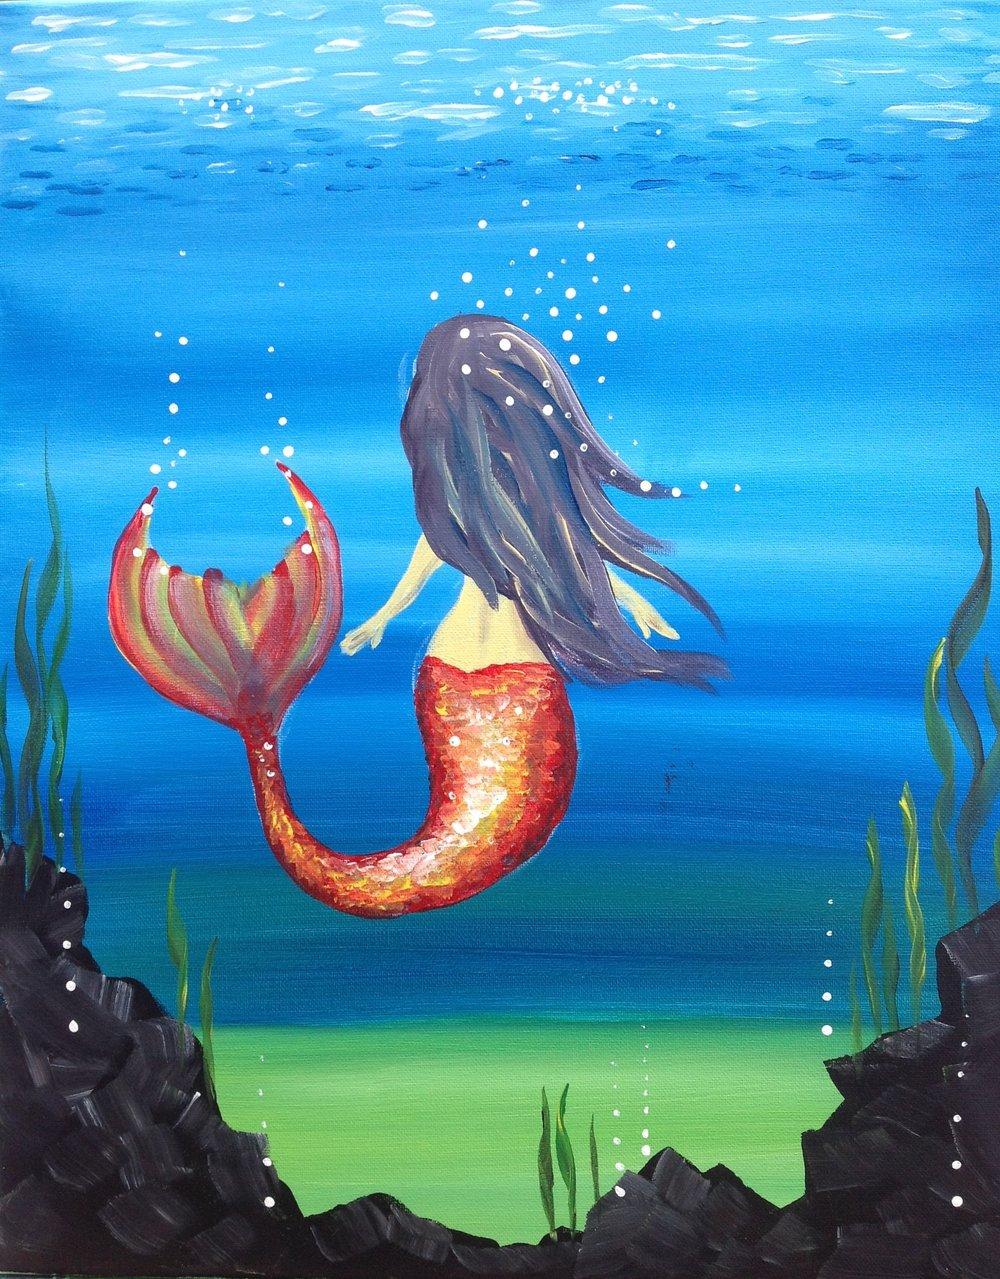 Mermaids Realm